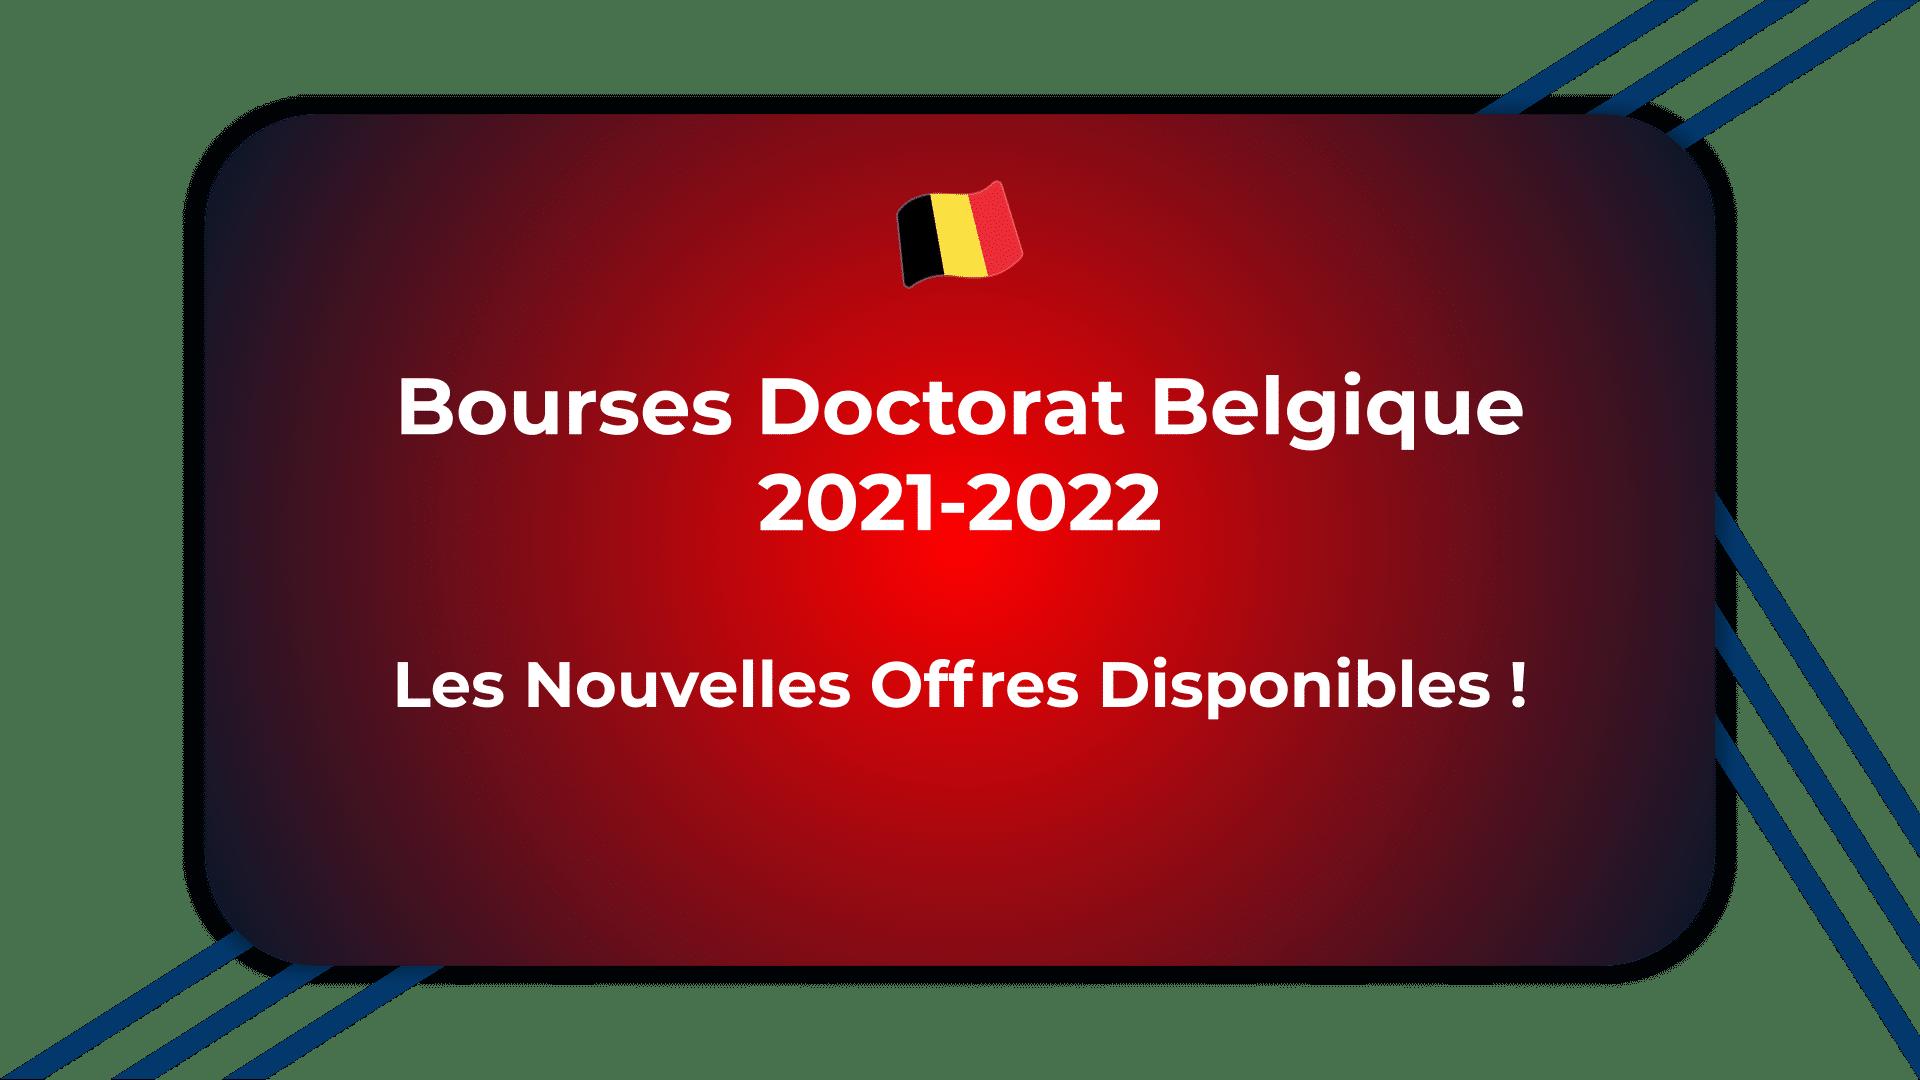 Bourses Doctorat Belgique